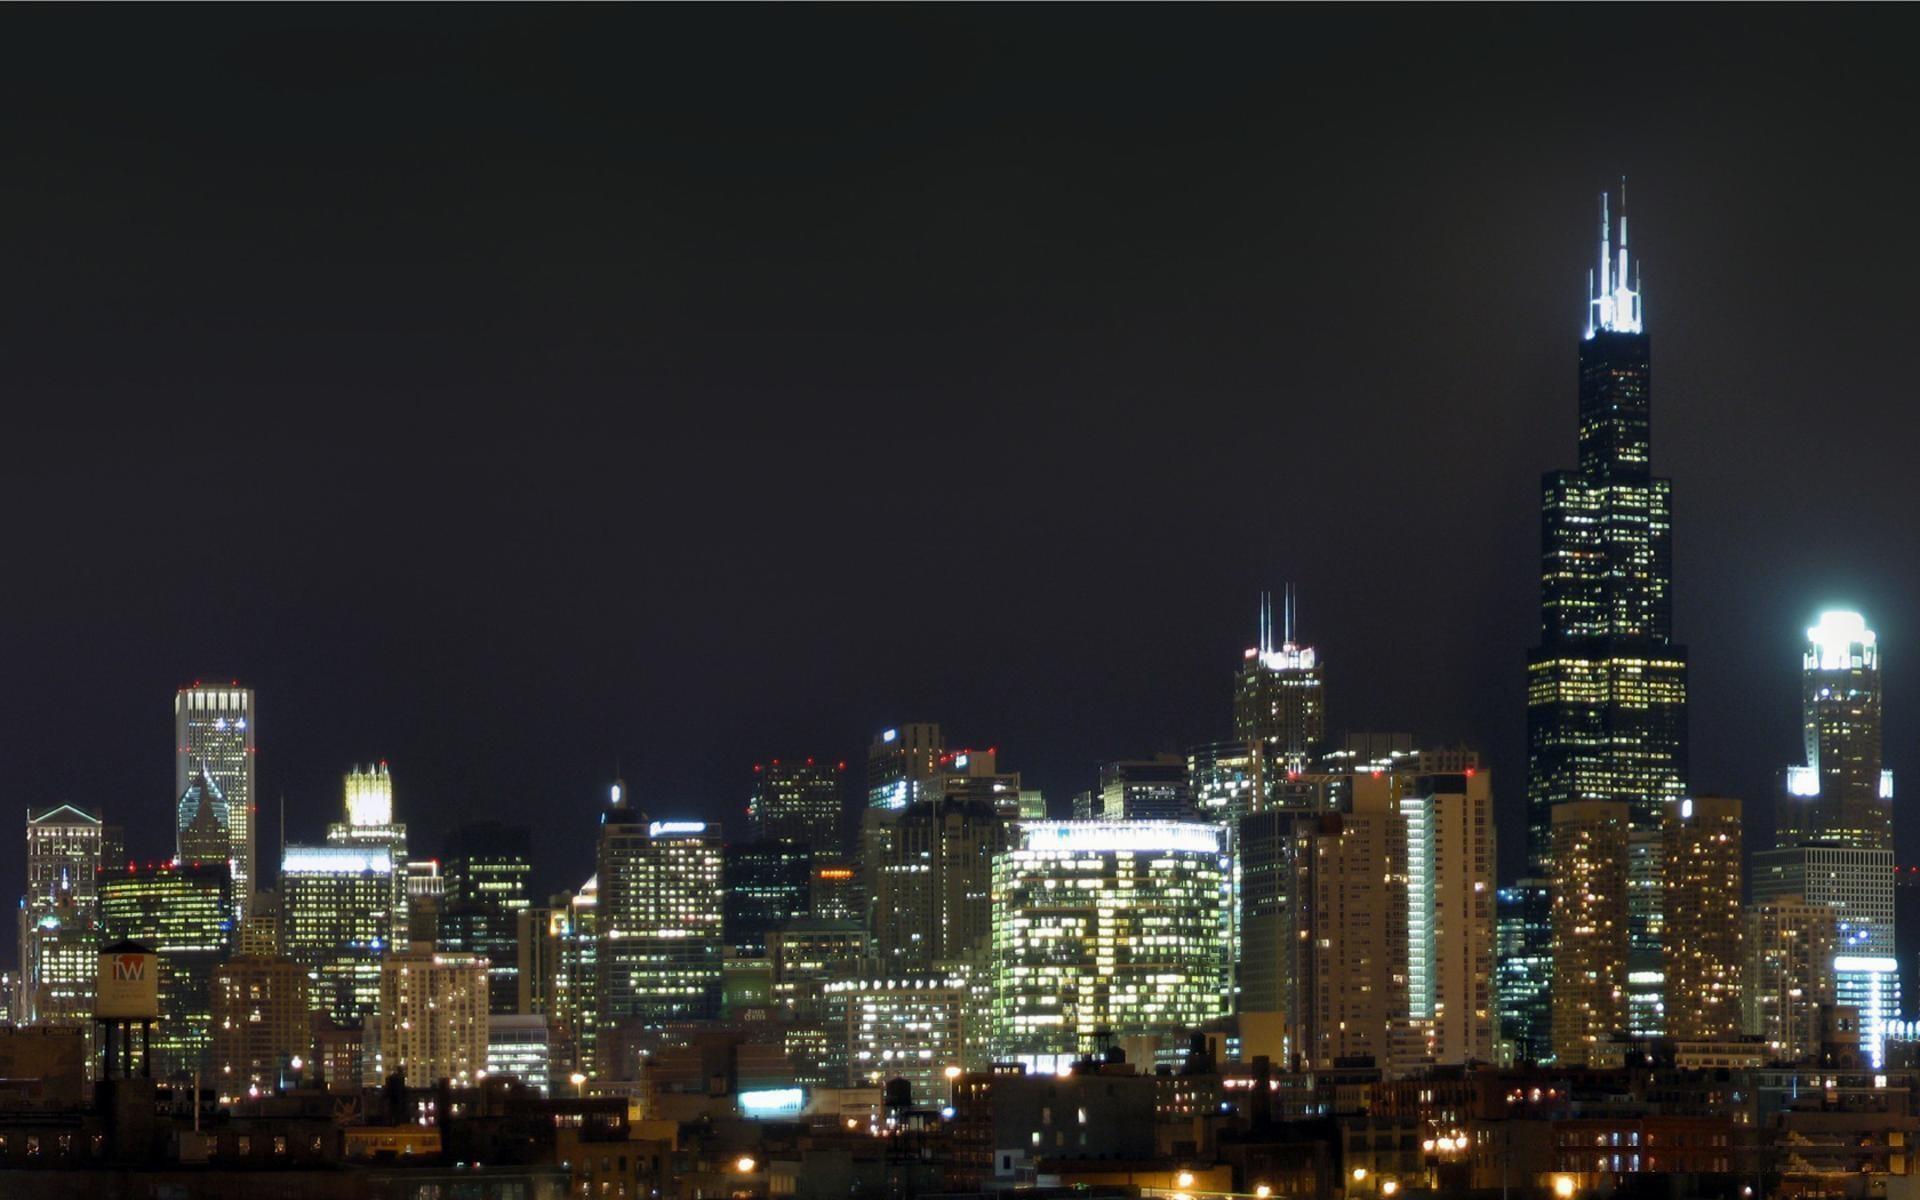 Chicago skyline hd wallpaper 77 images - Skyline night wallpaper ...